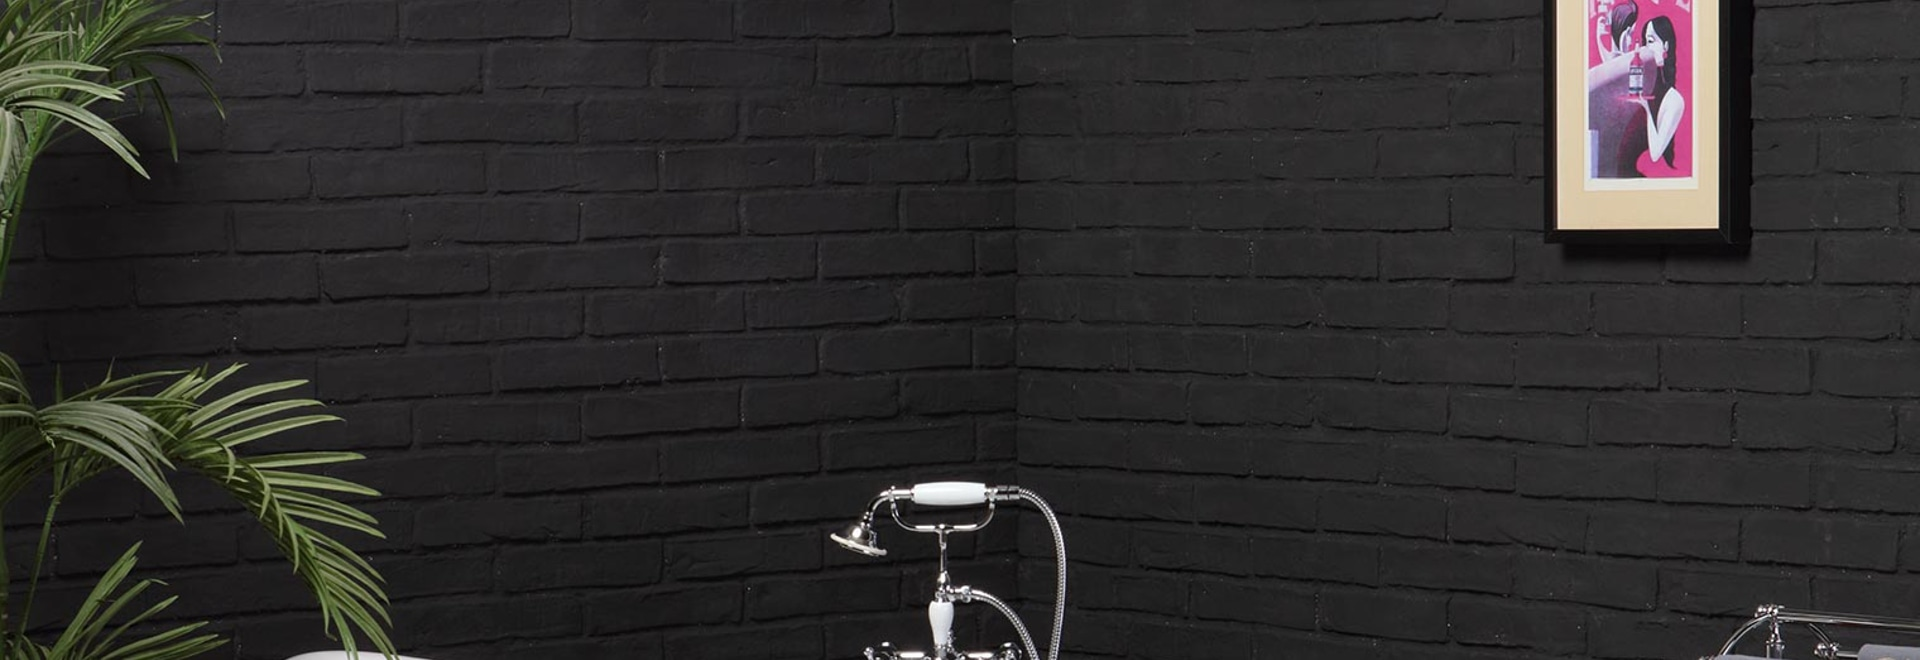 Coloured cast iron bathtub for your home